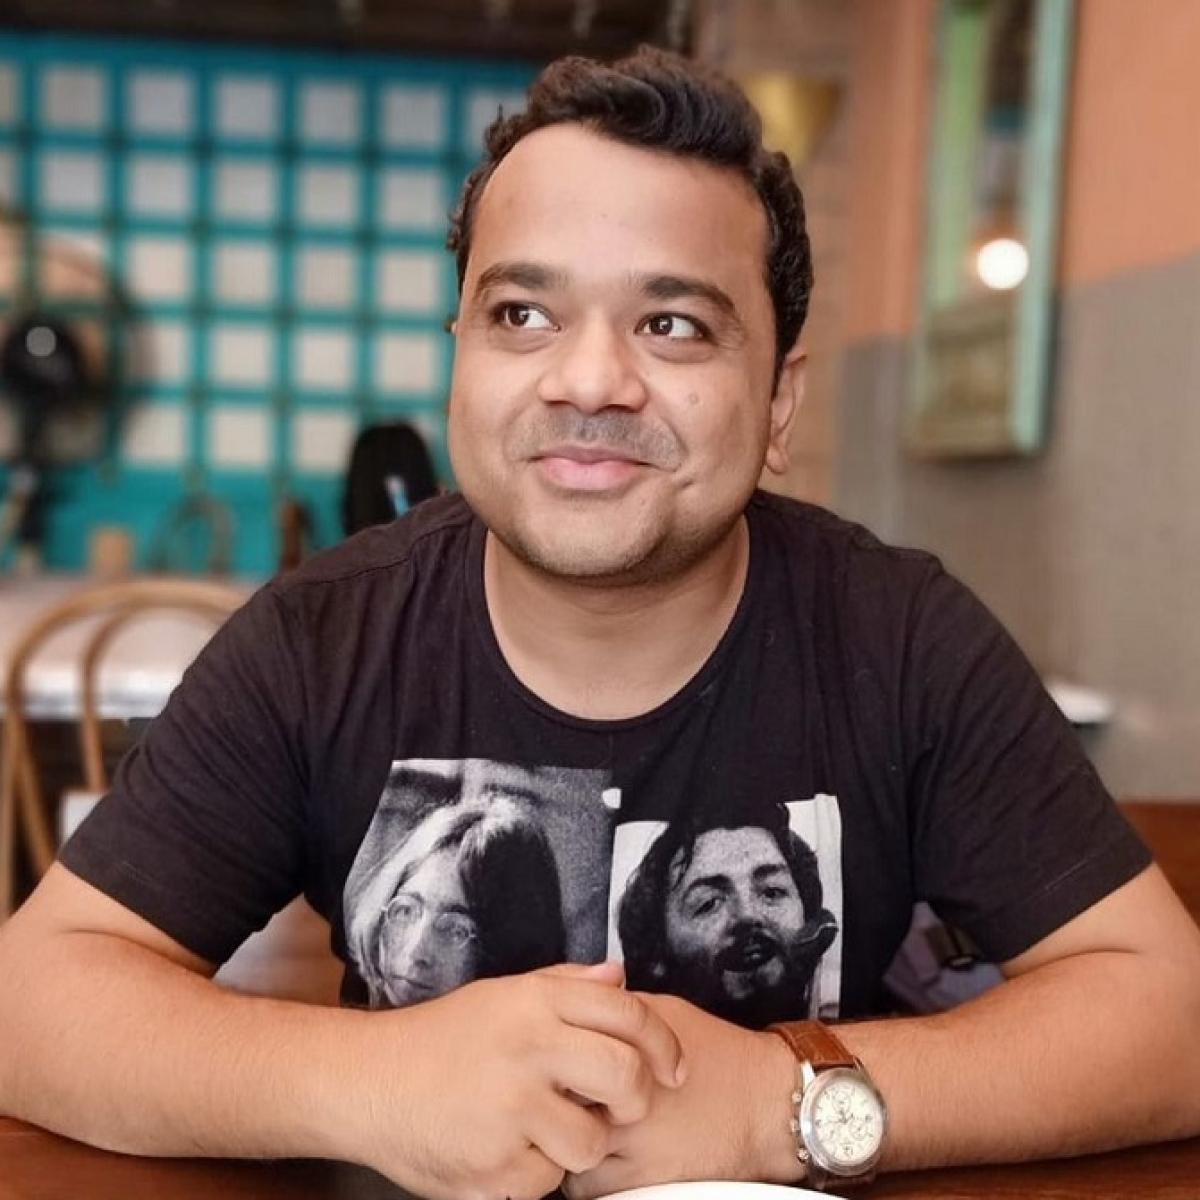 Live Streaming Demigods: Comedian Kumar Varun talks about Random Chikibum, superchats, and staying sane during COVID-19 lockdown